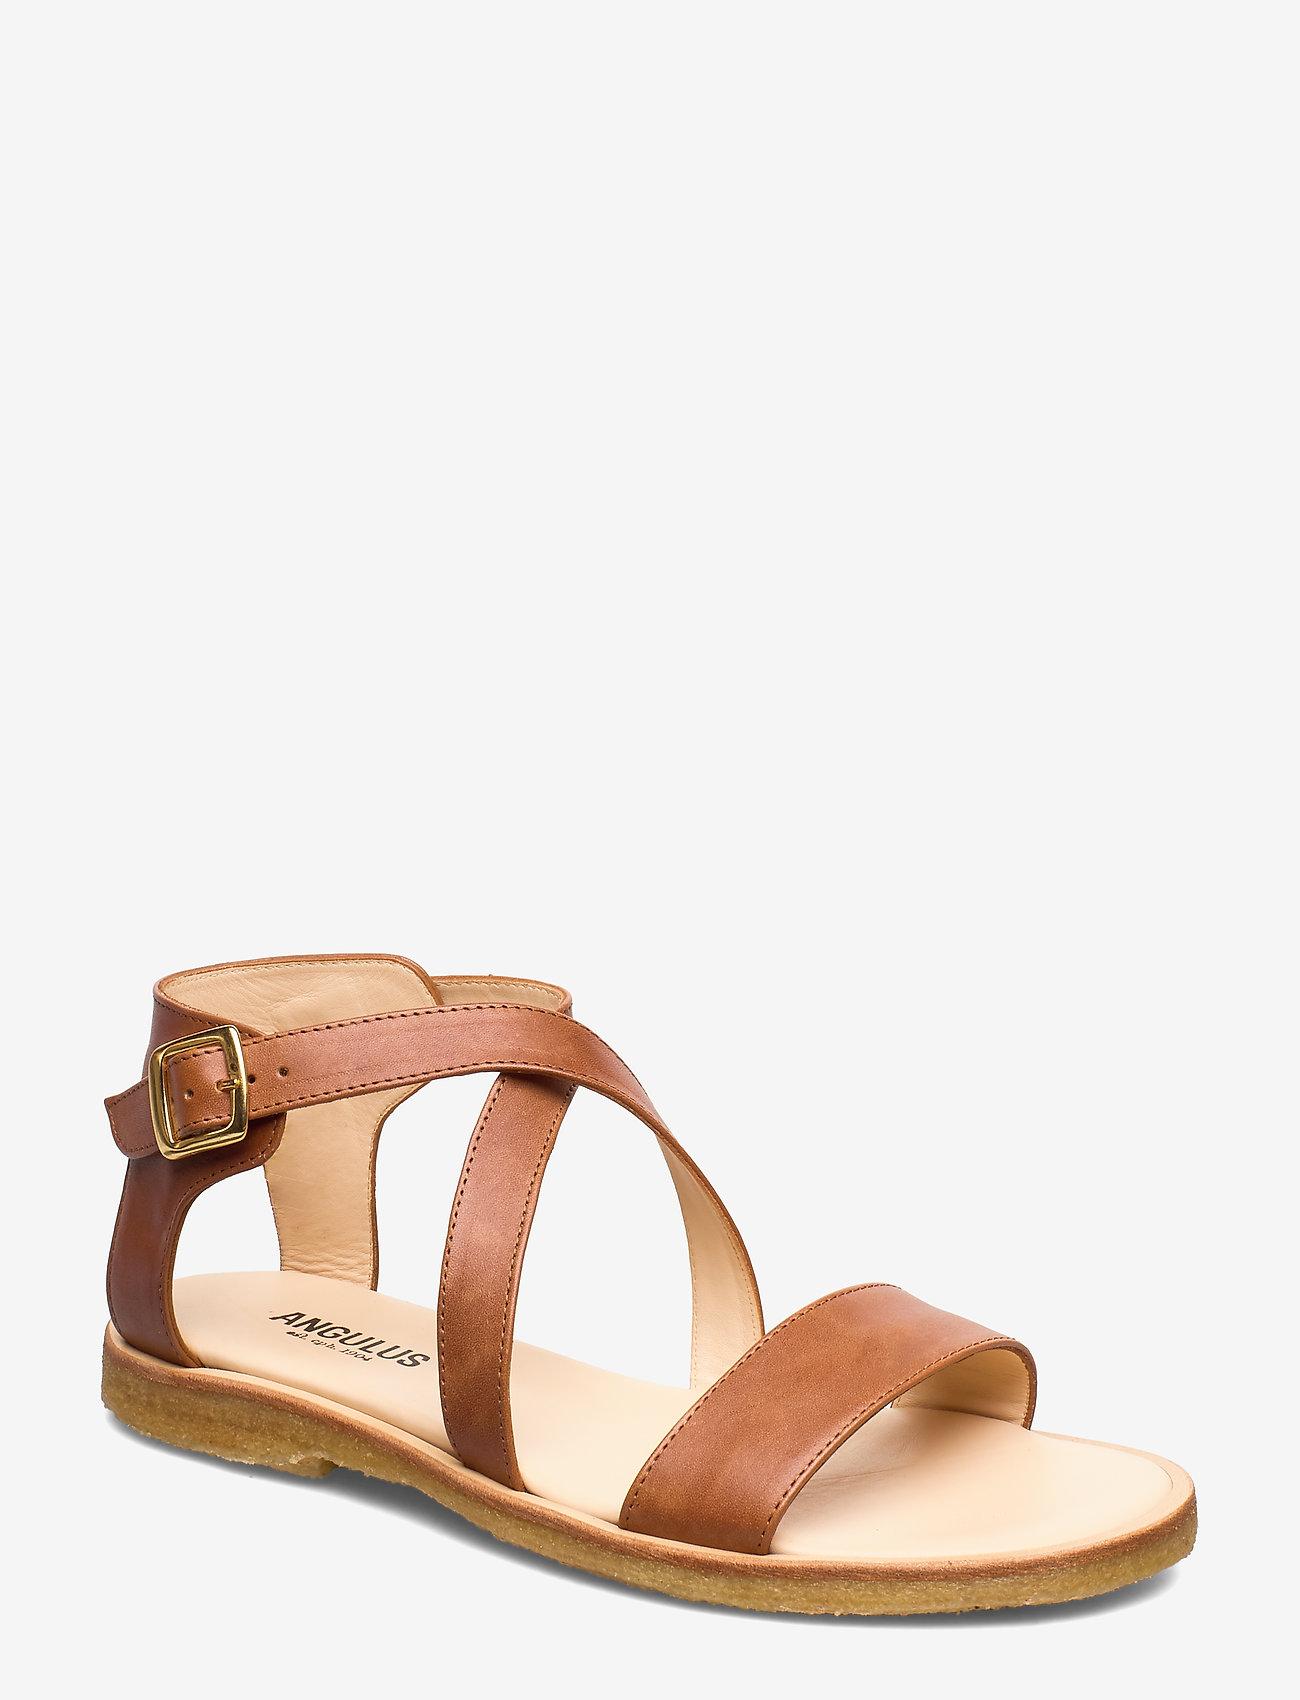 ANGULUS - 5442 - flade sandaler - 1789 tan - 0